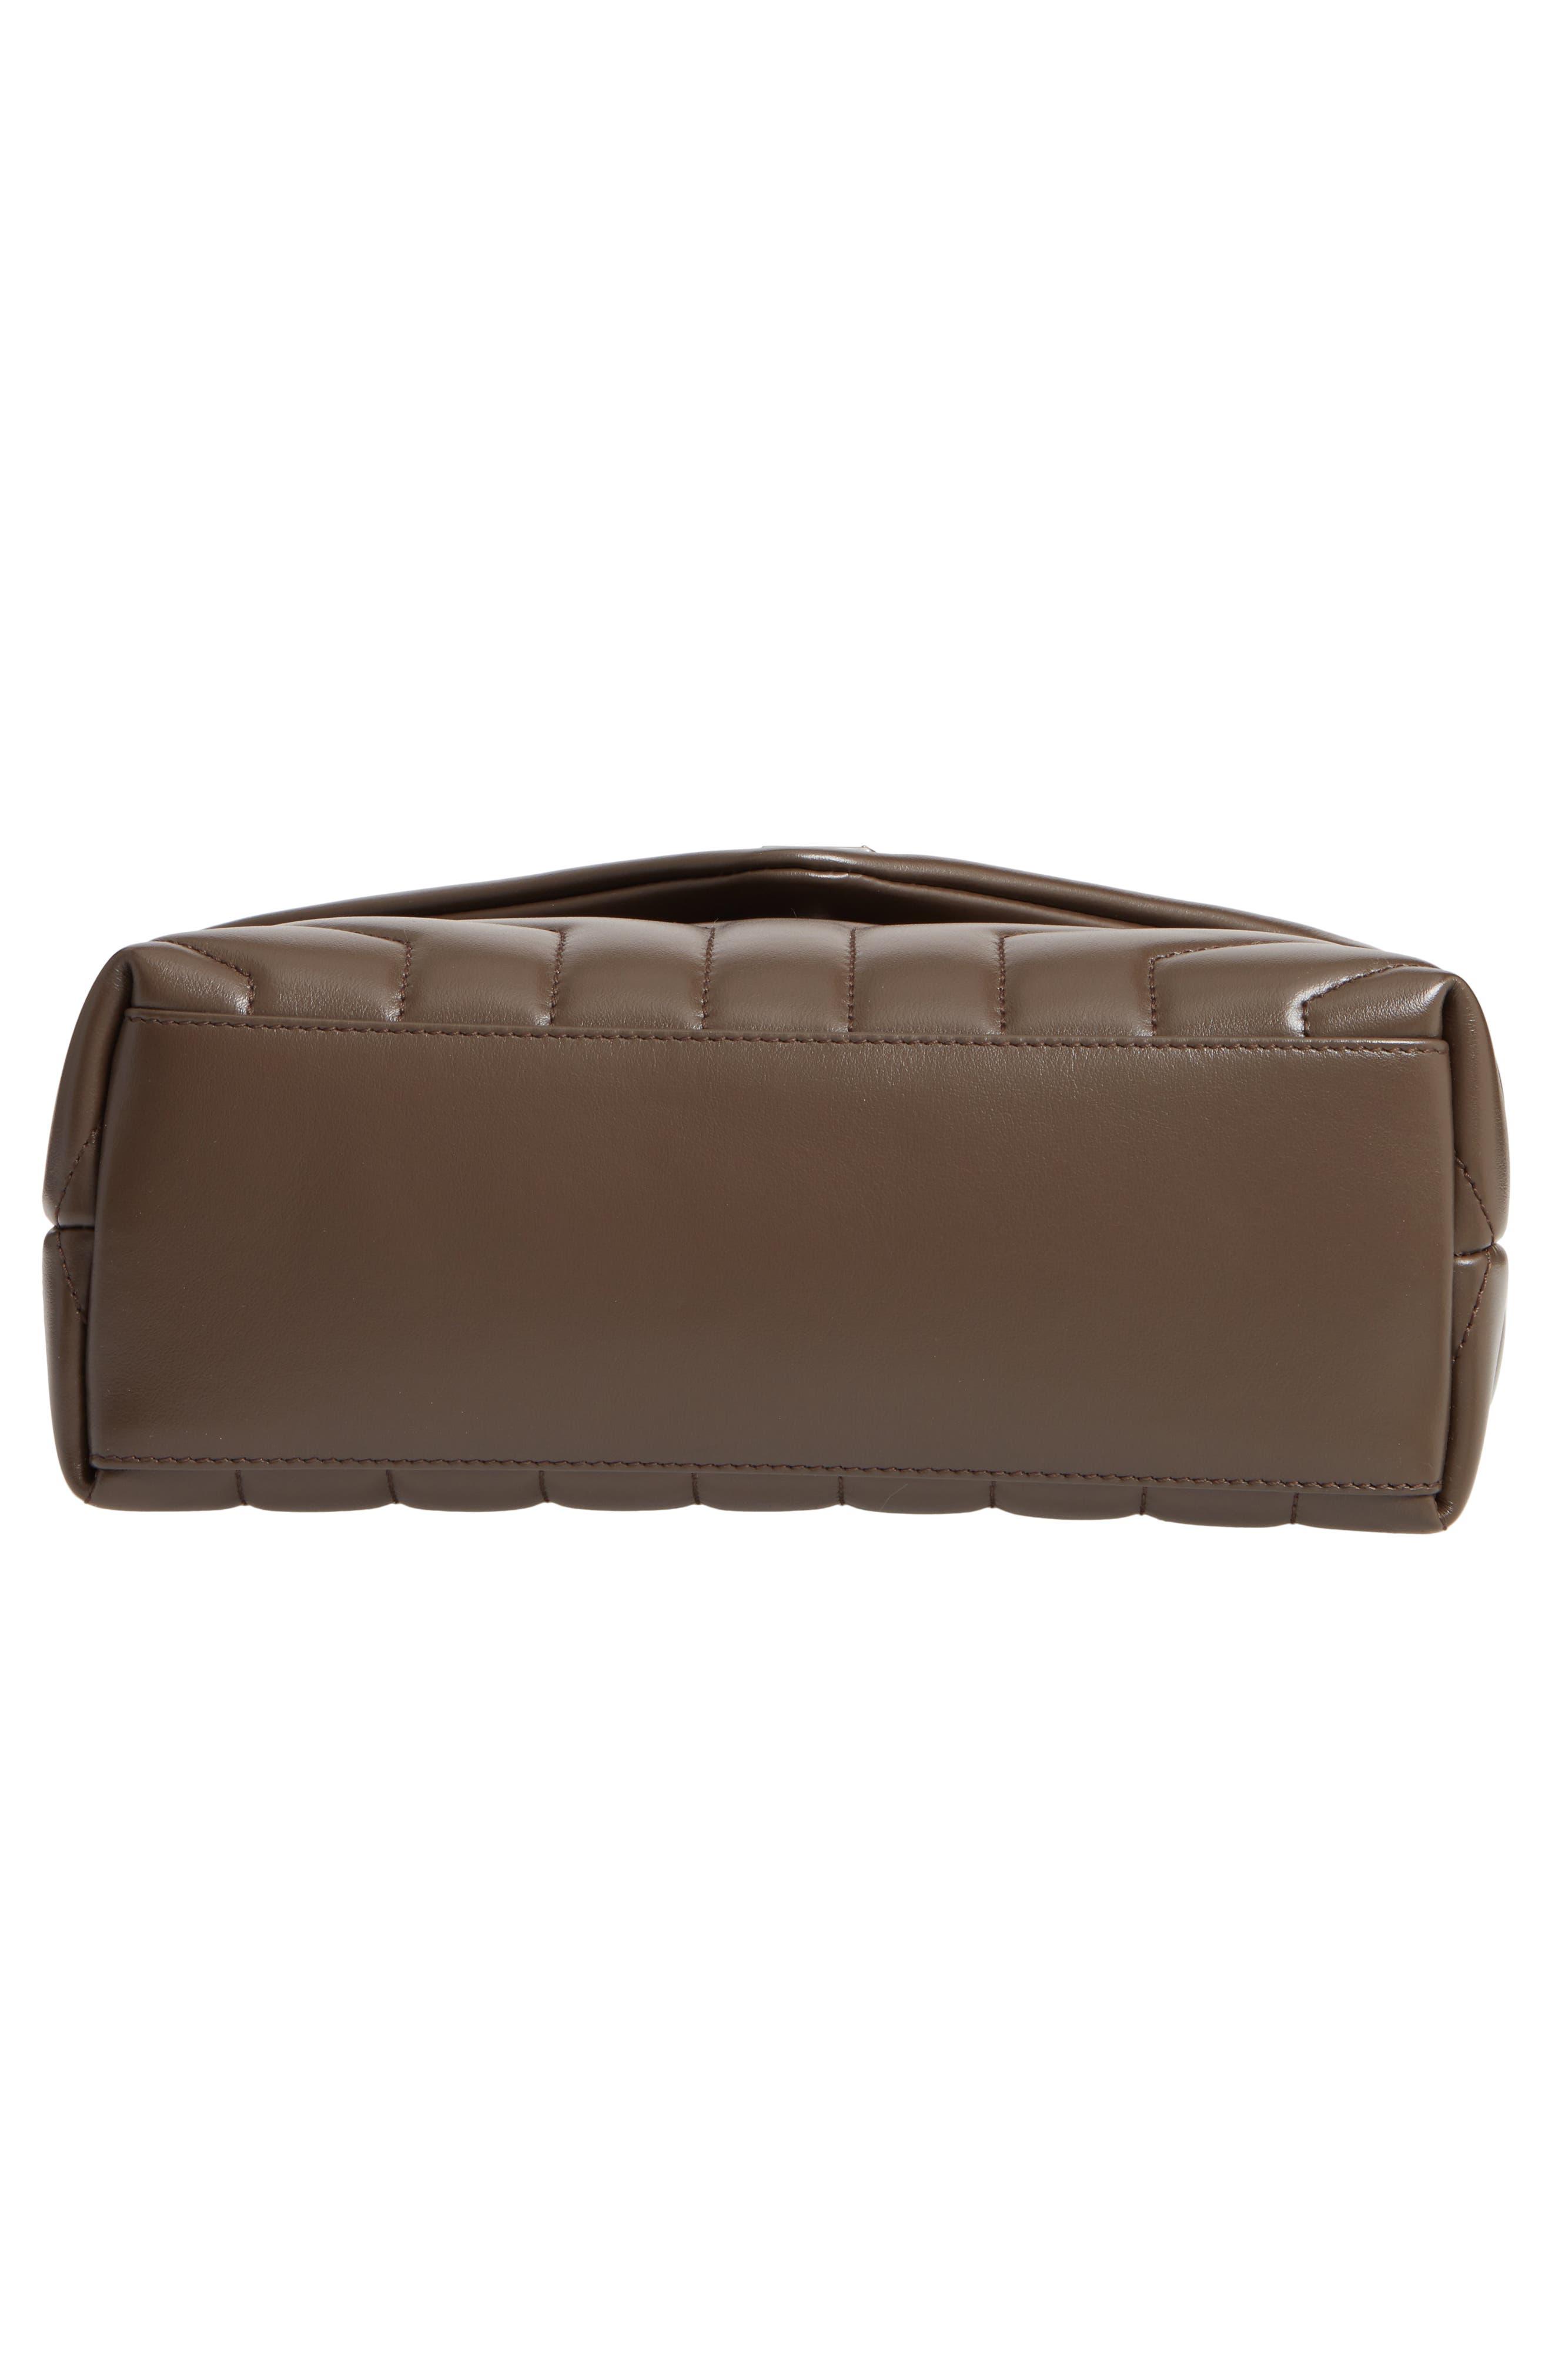 ,                             Small Loulou Matelassé Leather Shoulder Bag,                             Alternate thumbnail 6, color,                             FAGGIO/ FAGGIO